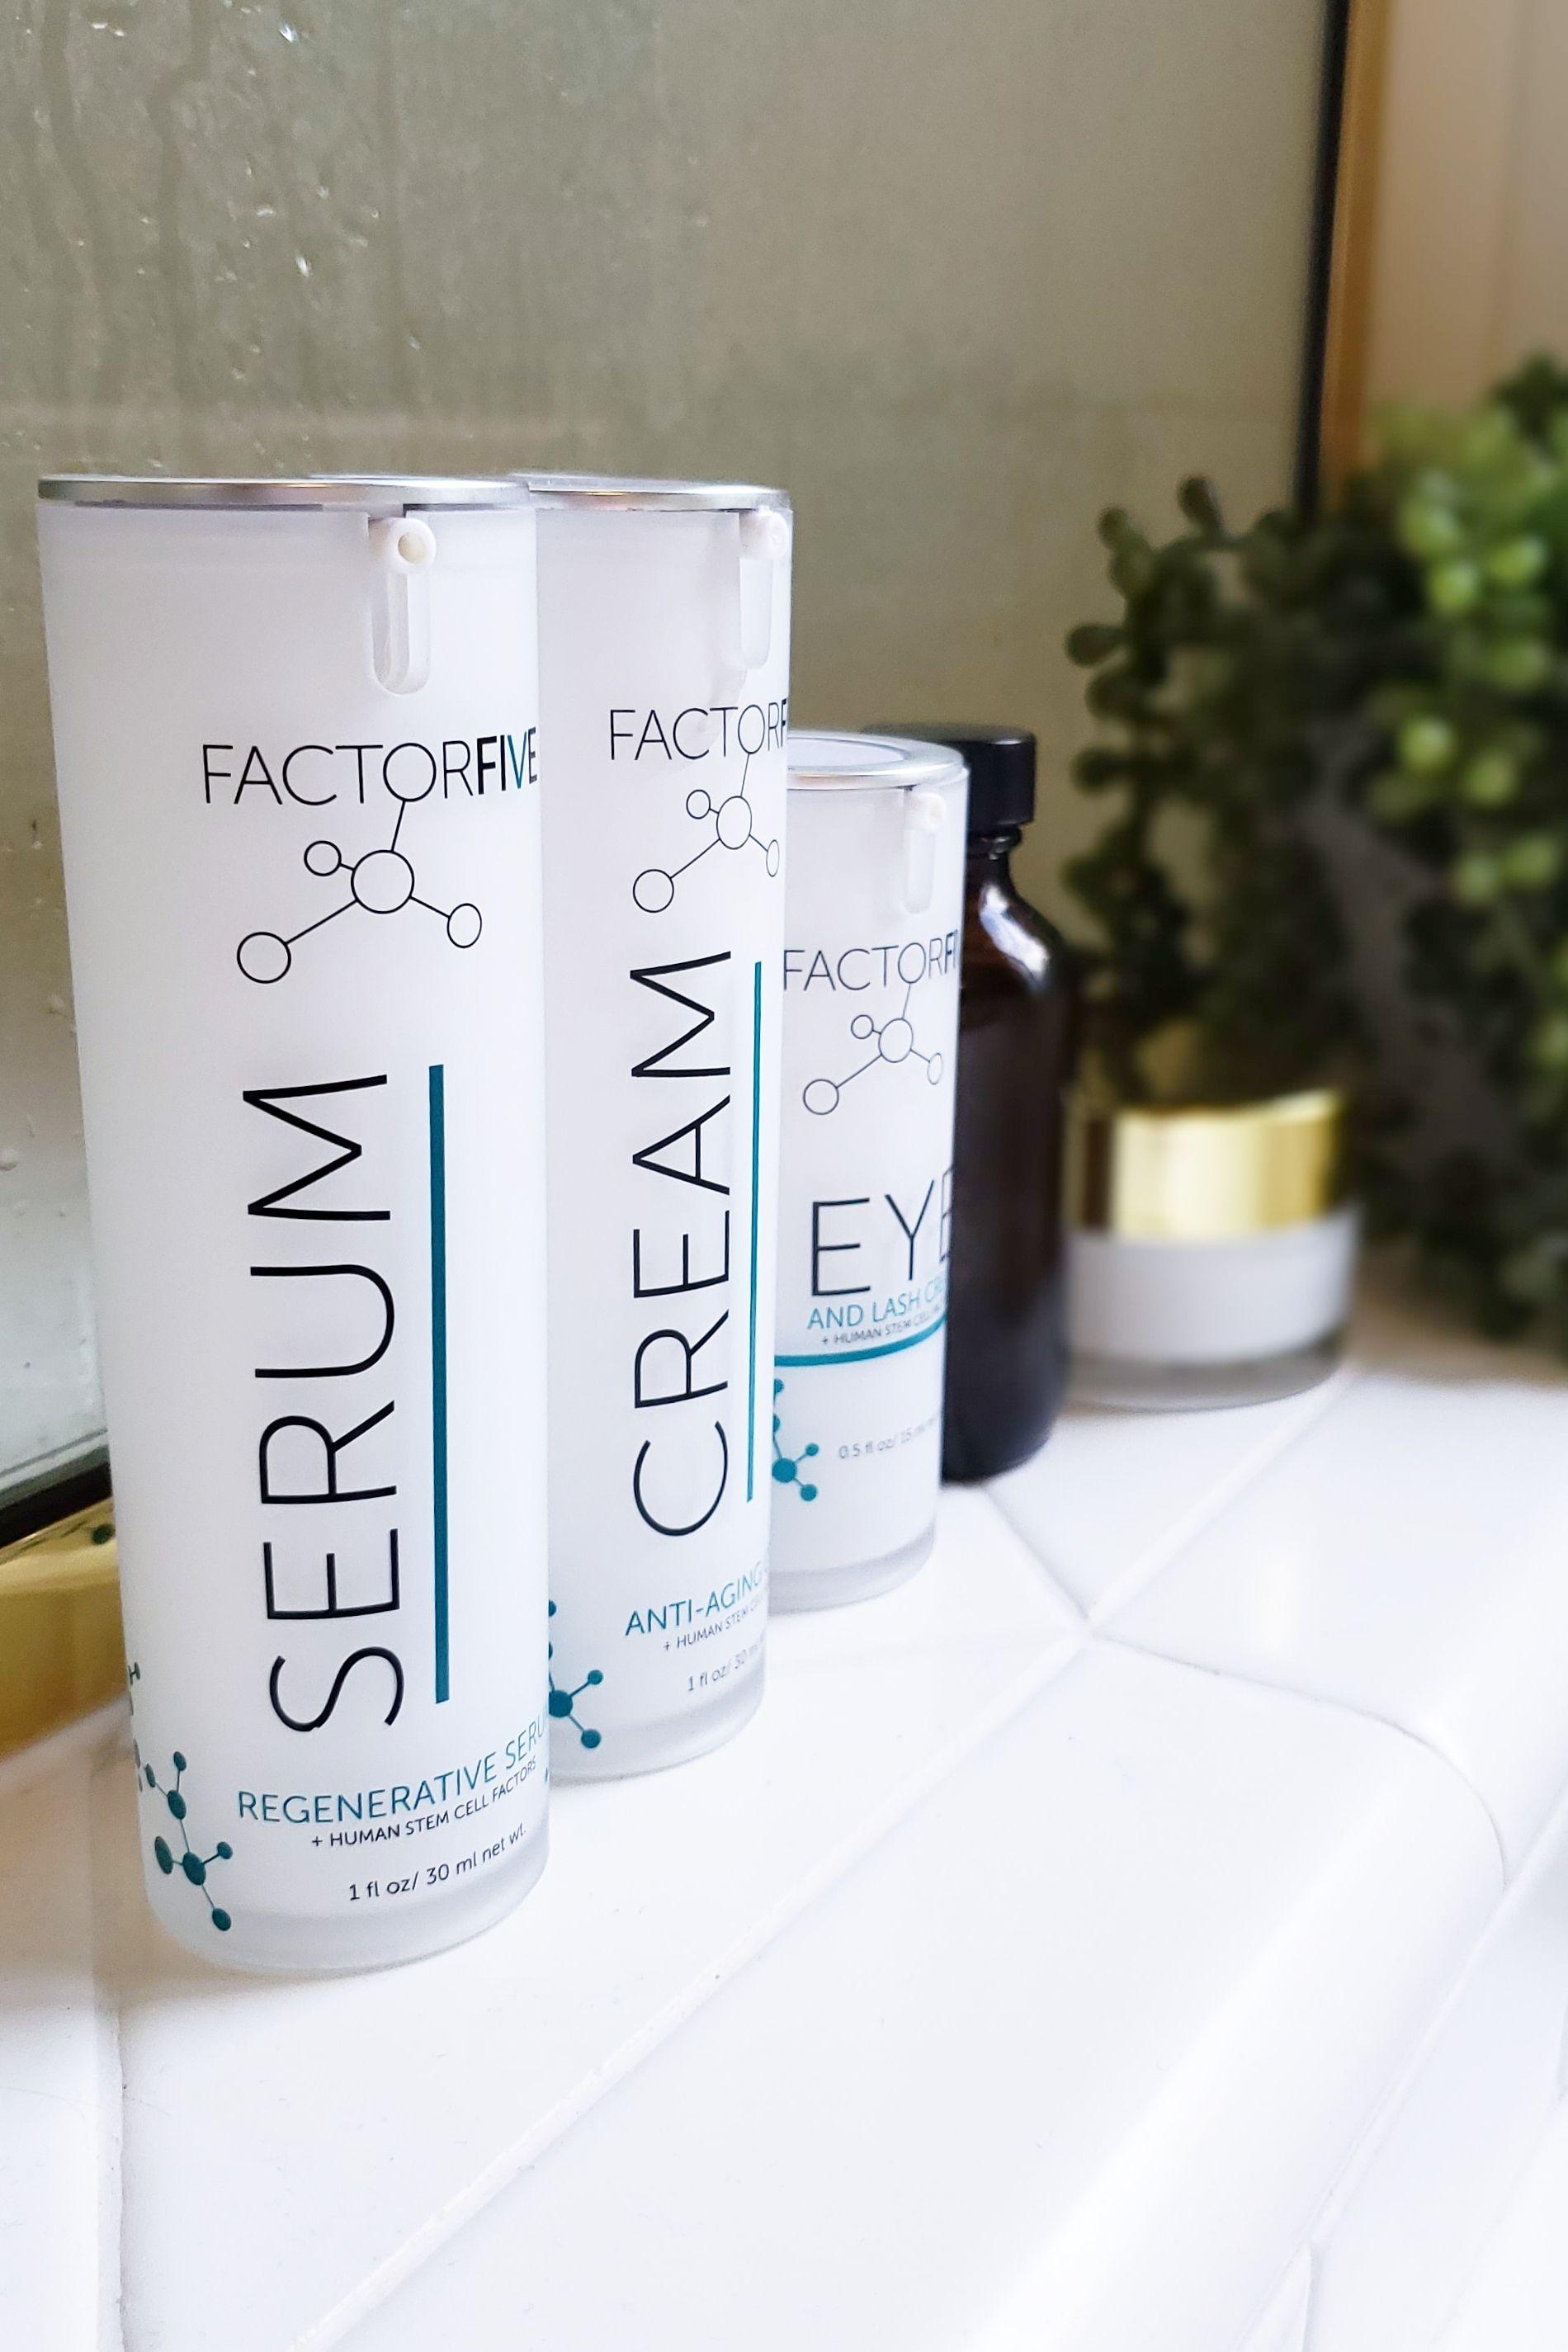 Growth Factors Best Skincare Anti Aging In 2020 Stem Cells Anti Aging Skin Care Skin Healing